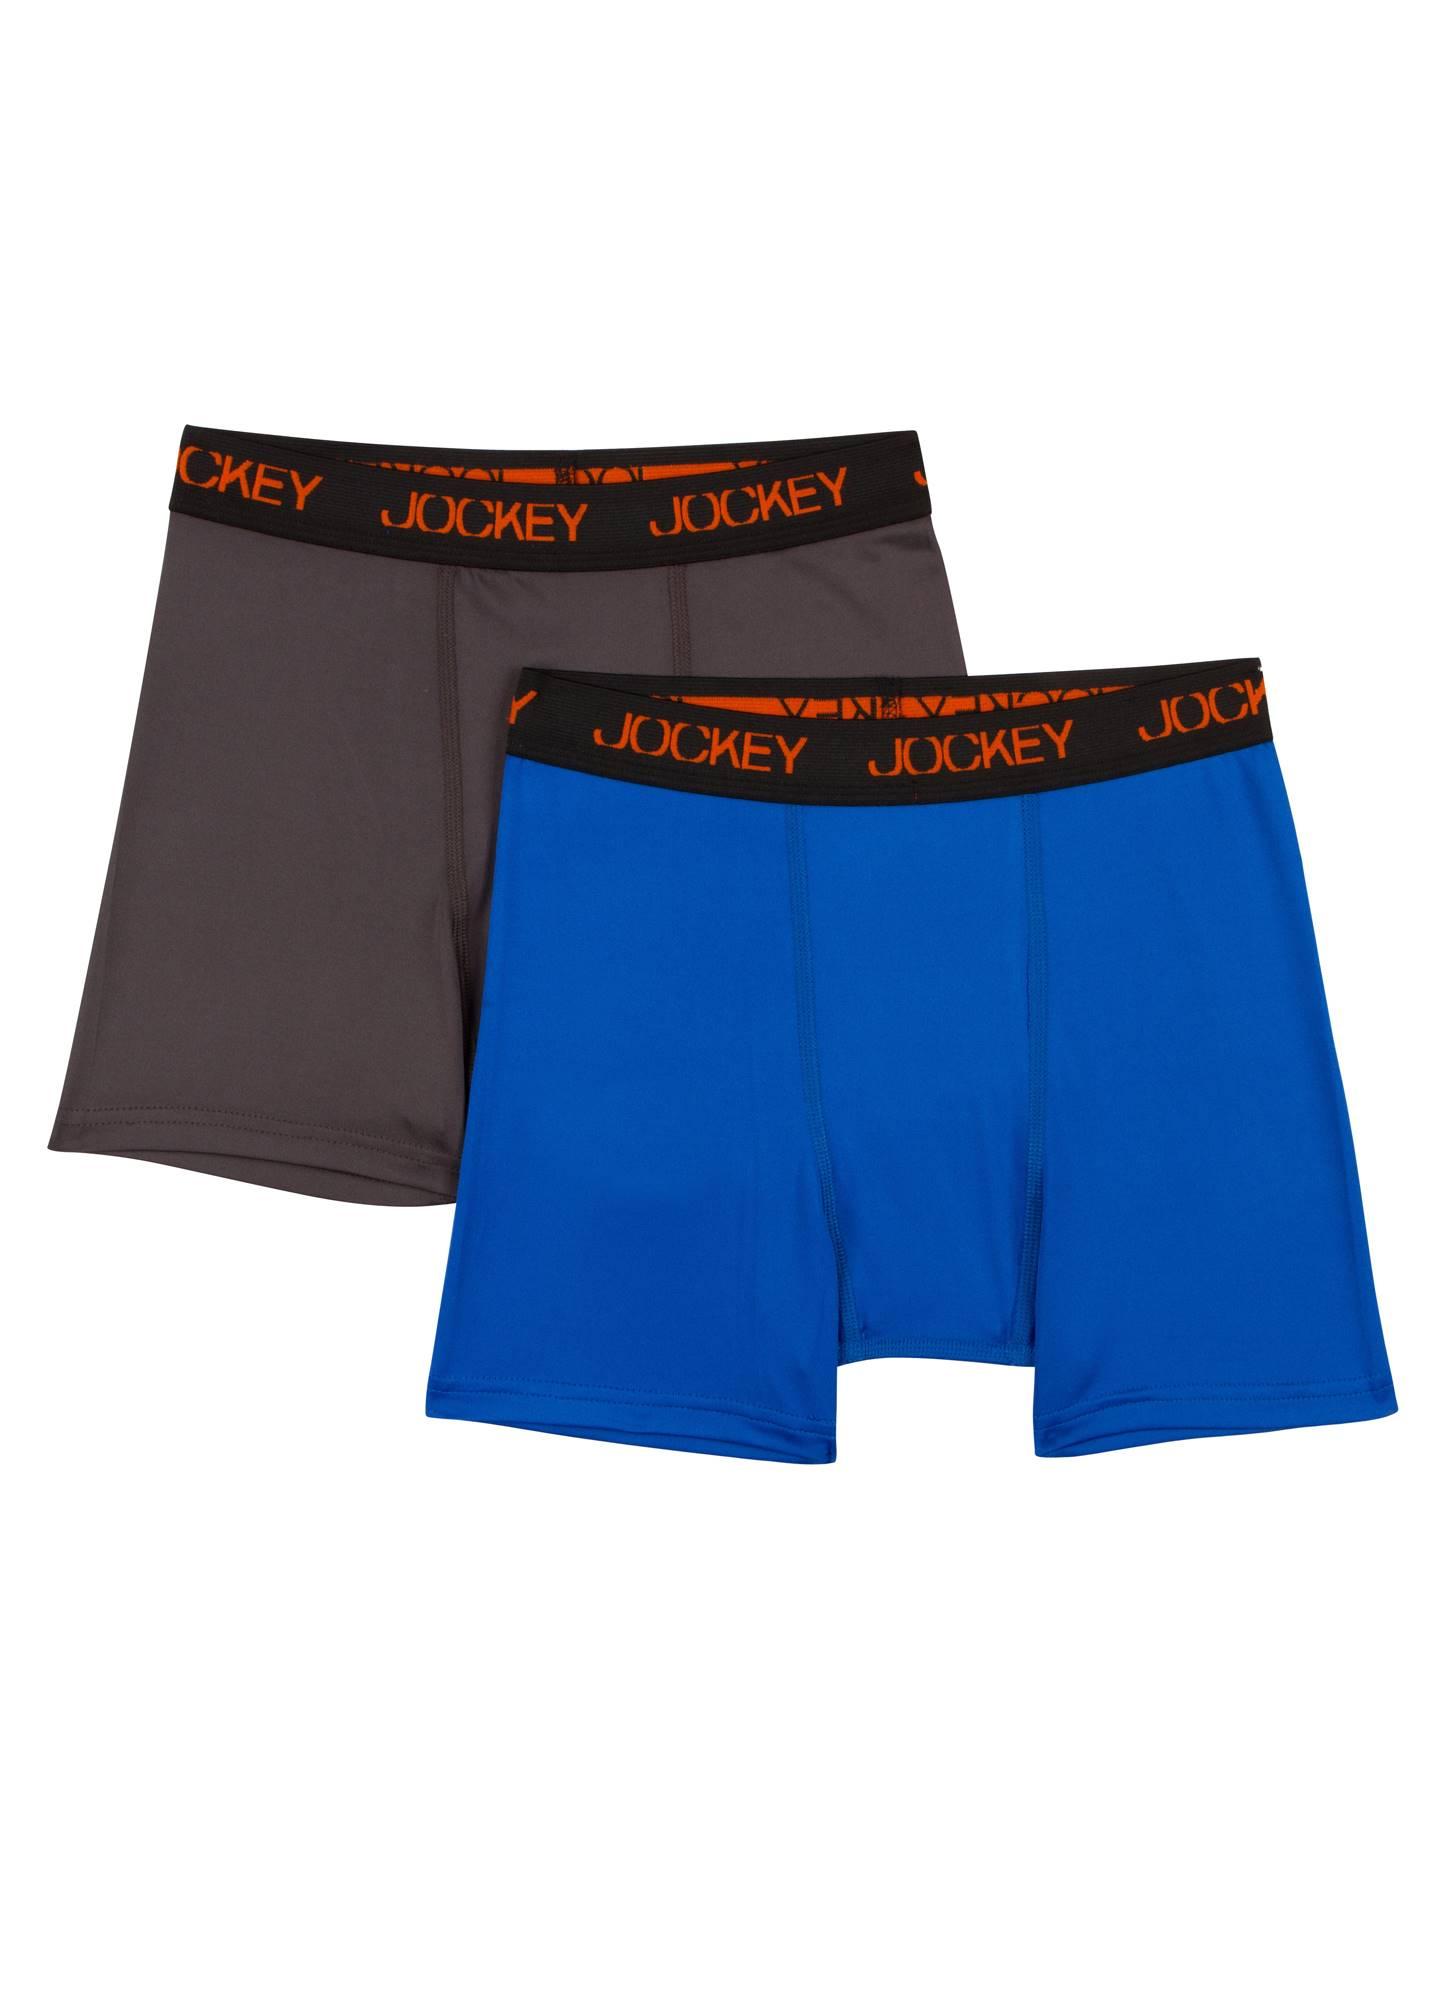 Pandazone Waist Cincher Trainer Body Tummy Girdle Control Corset Sport Shaper Belly